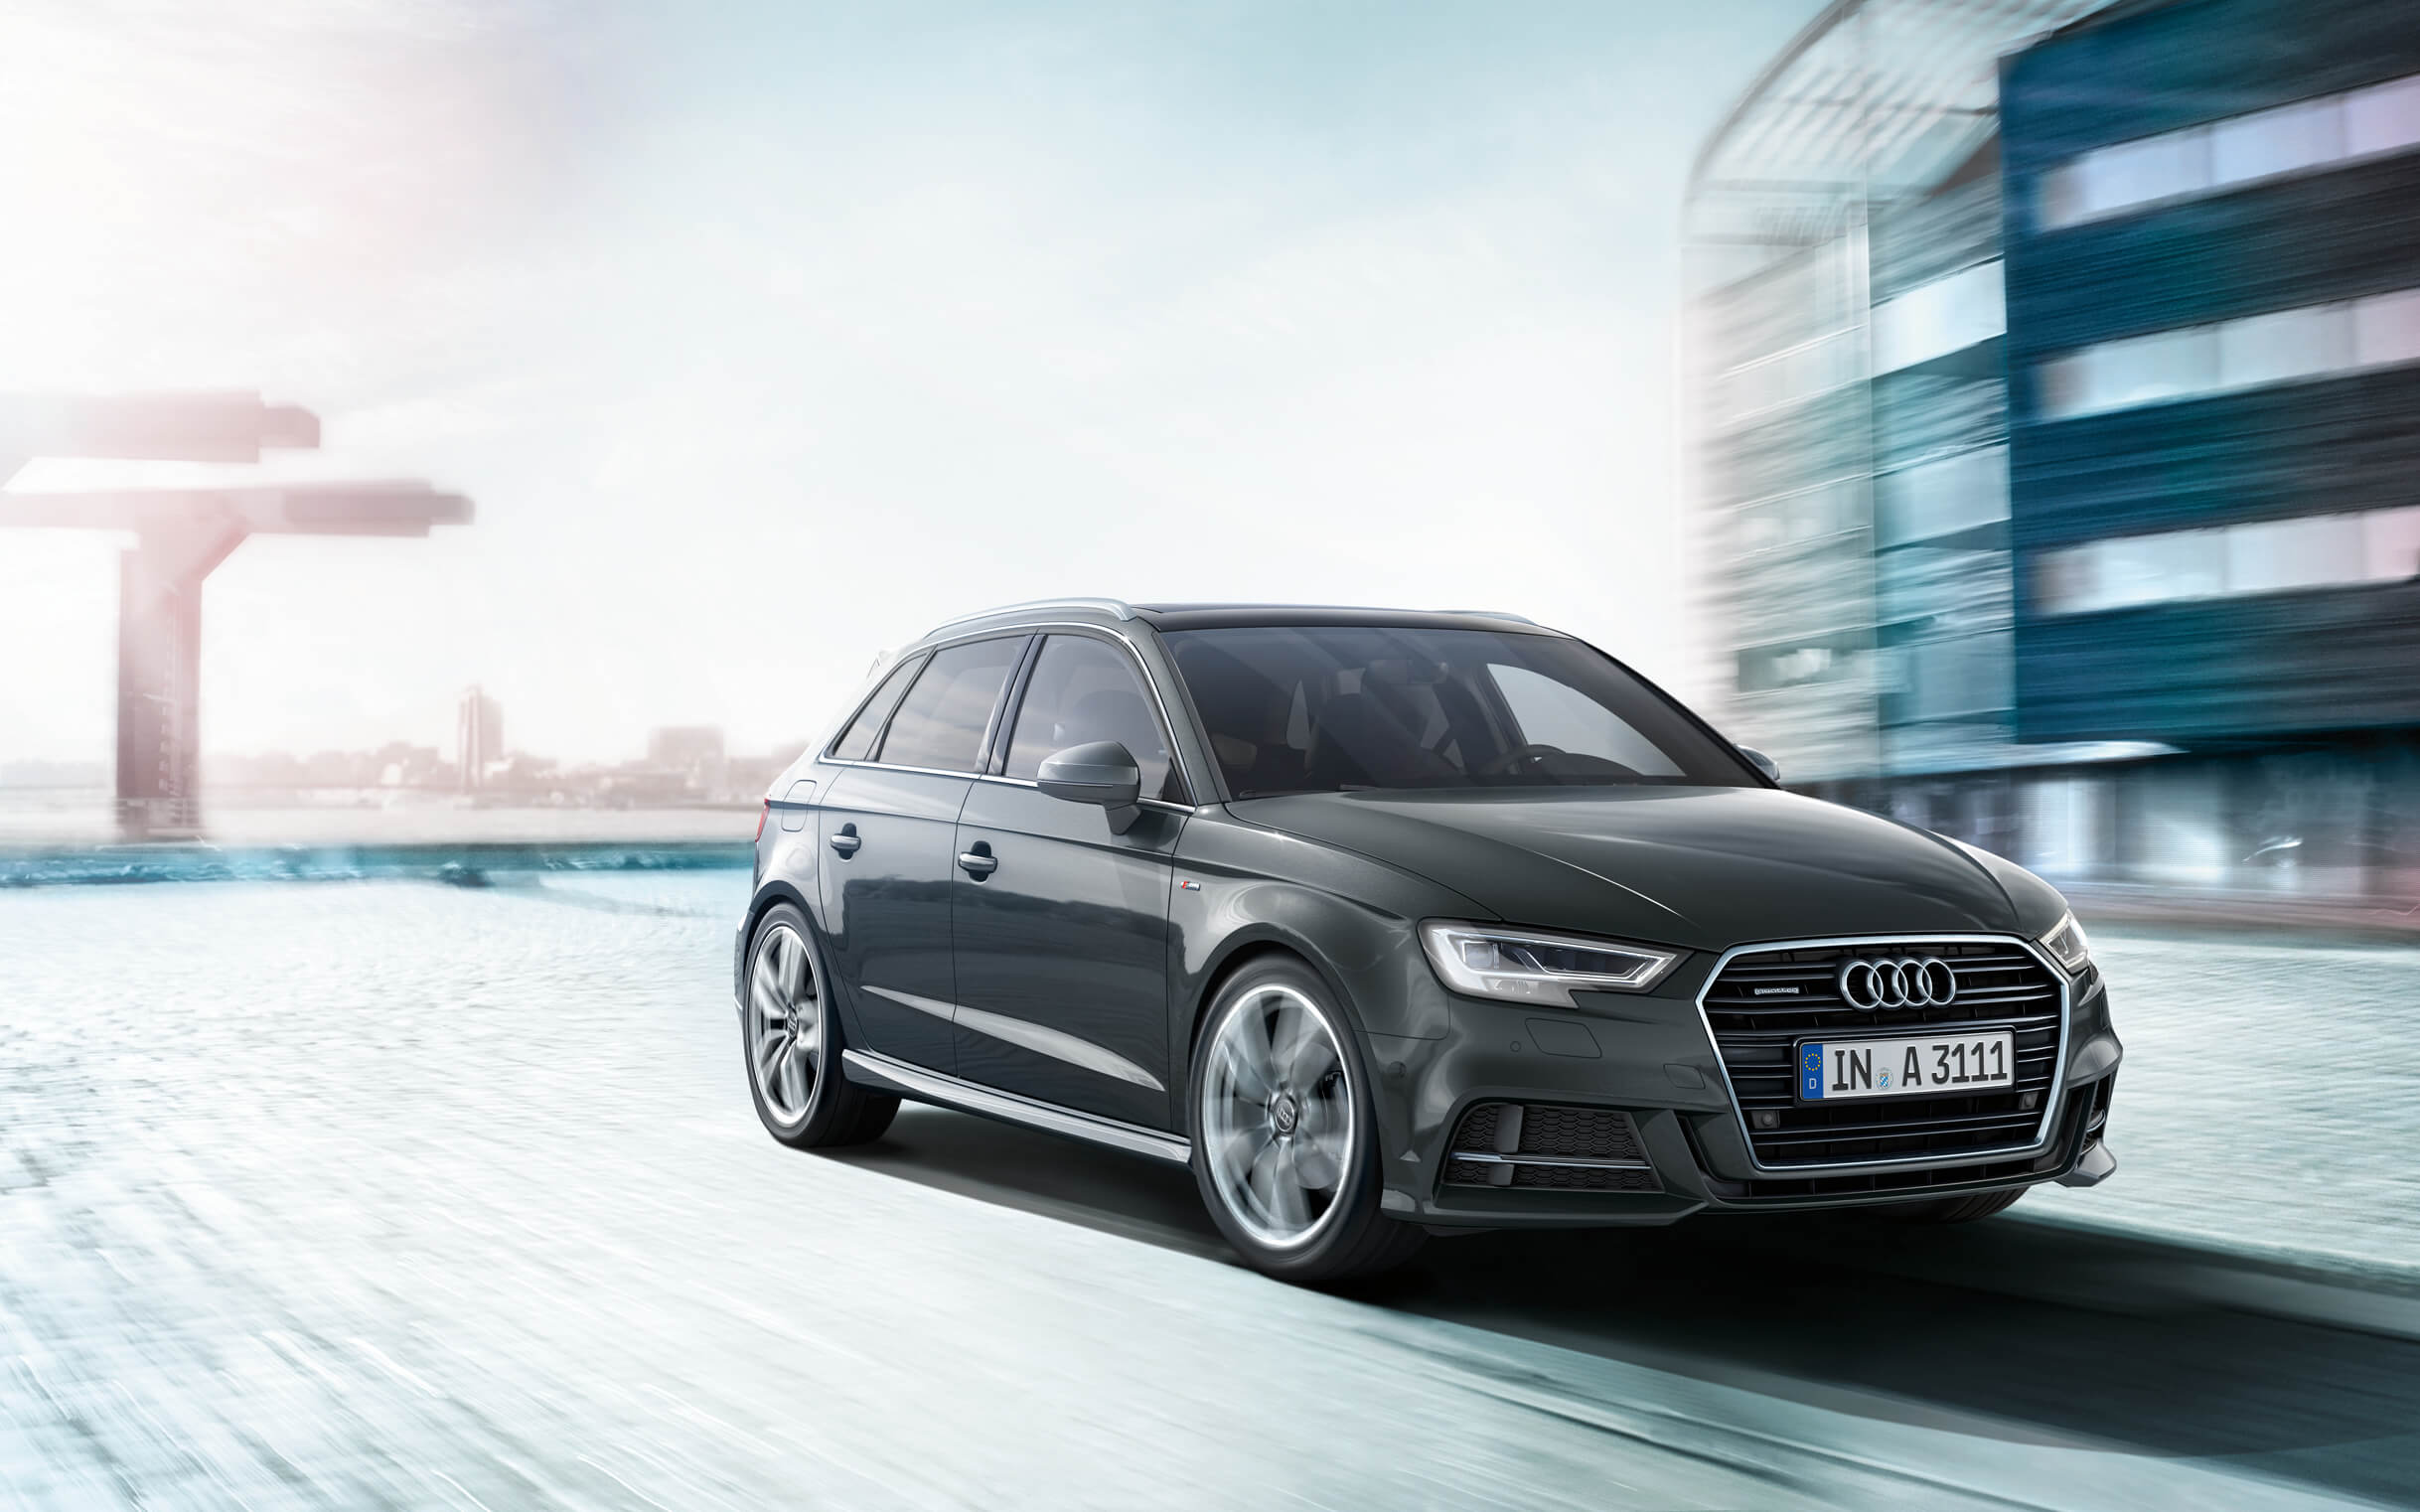 dark Audi A3 sportback against blurred background